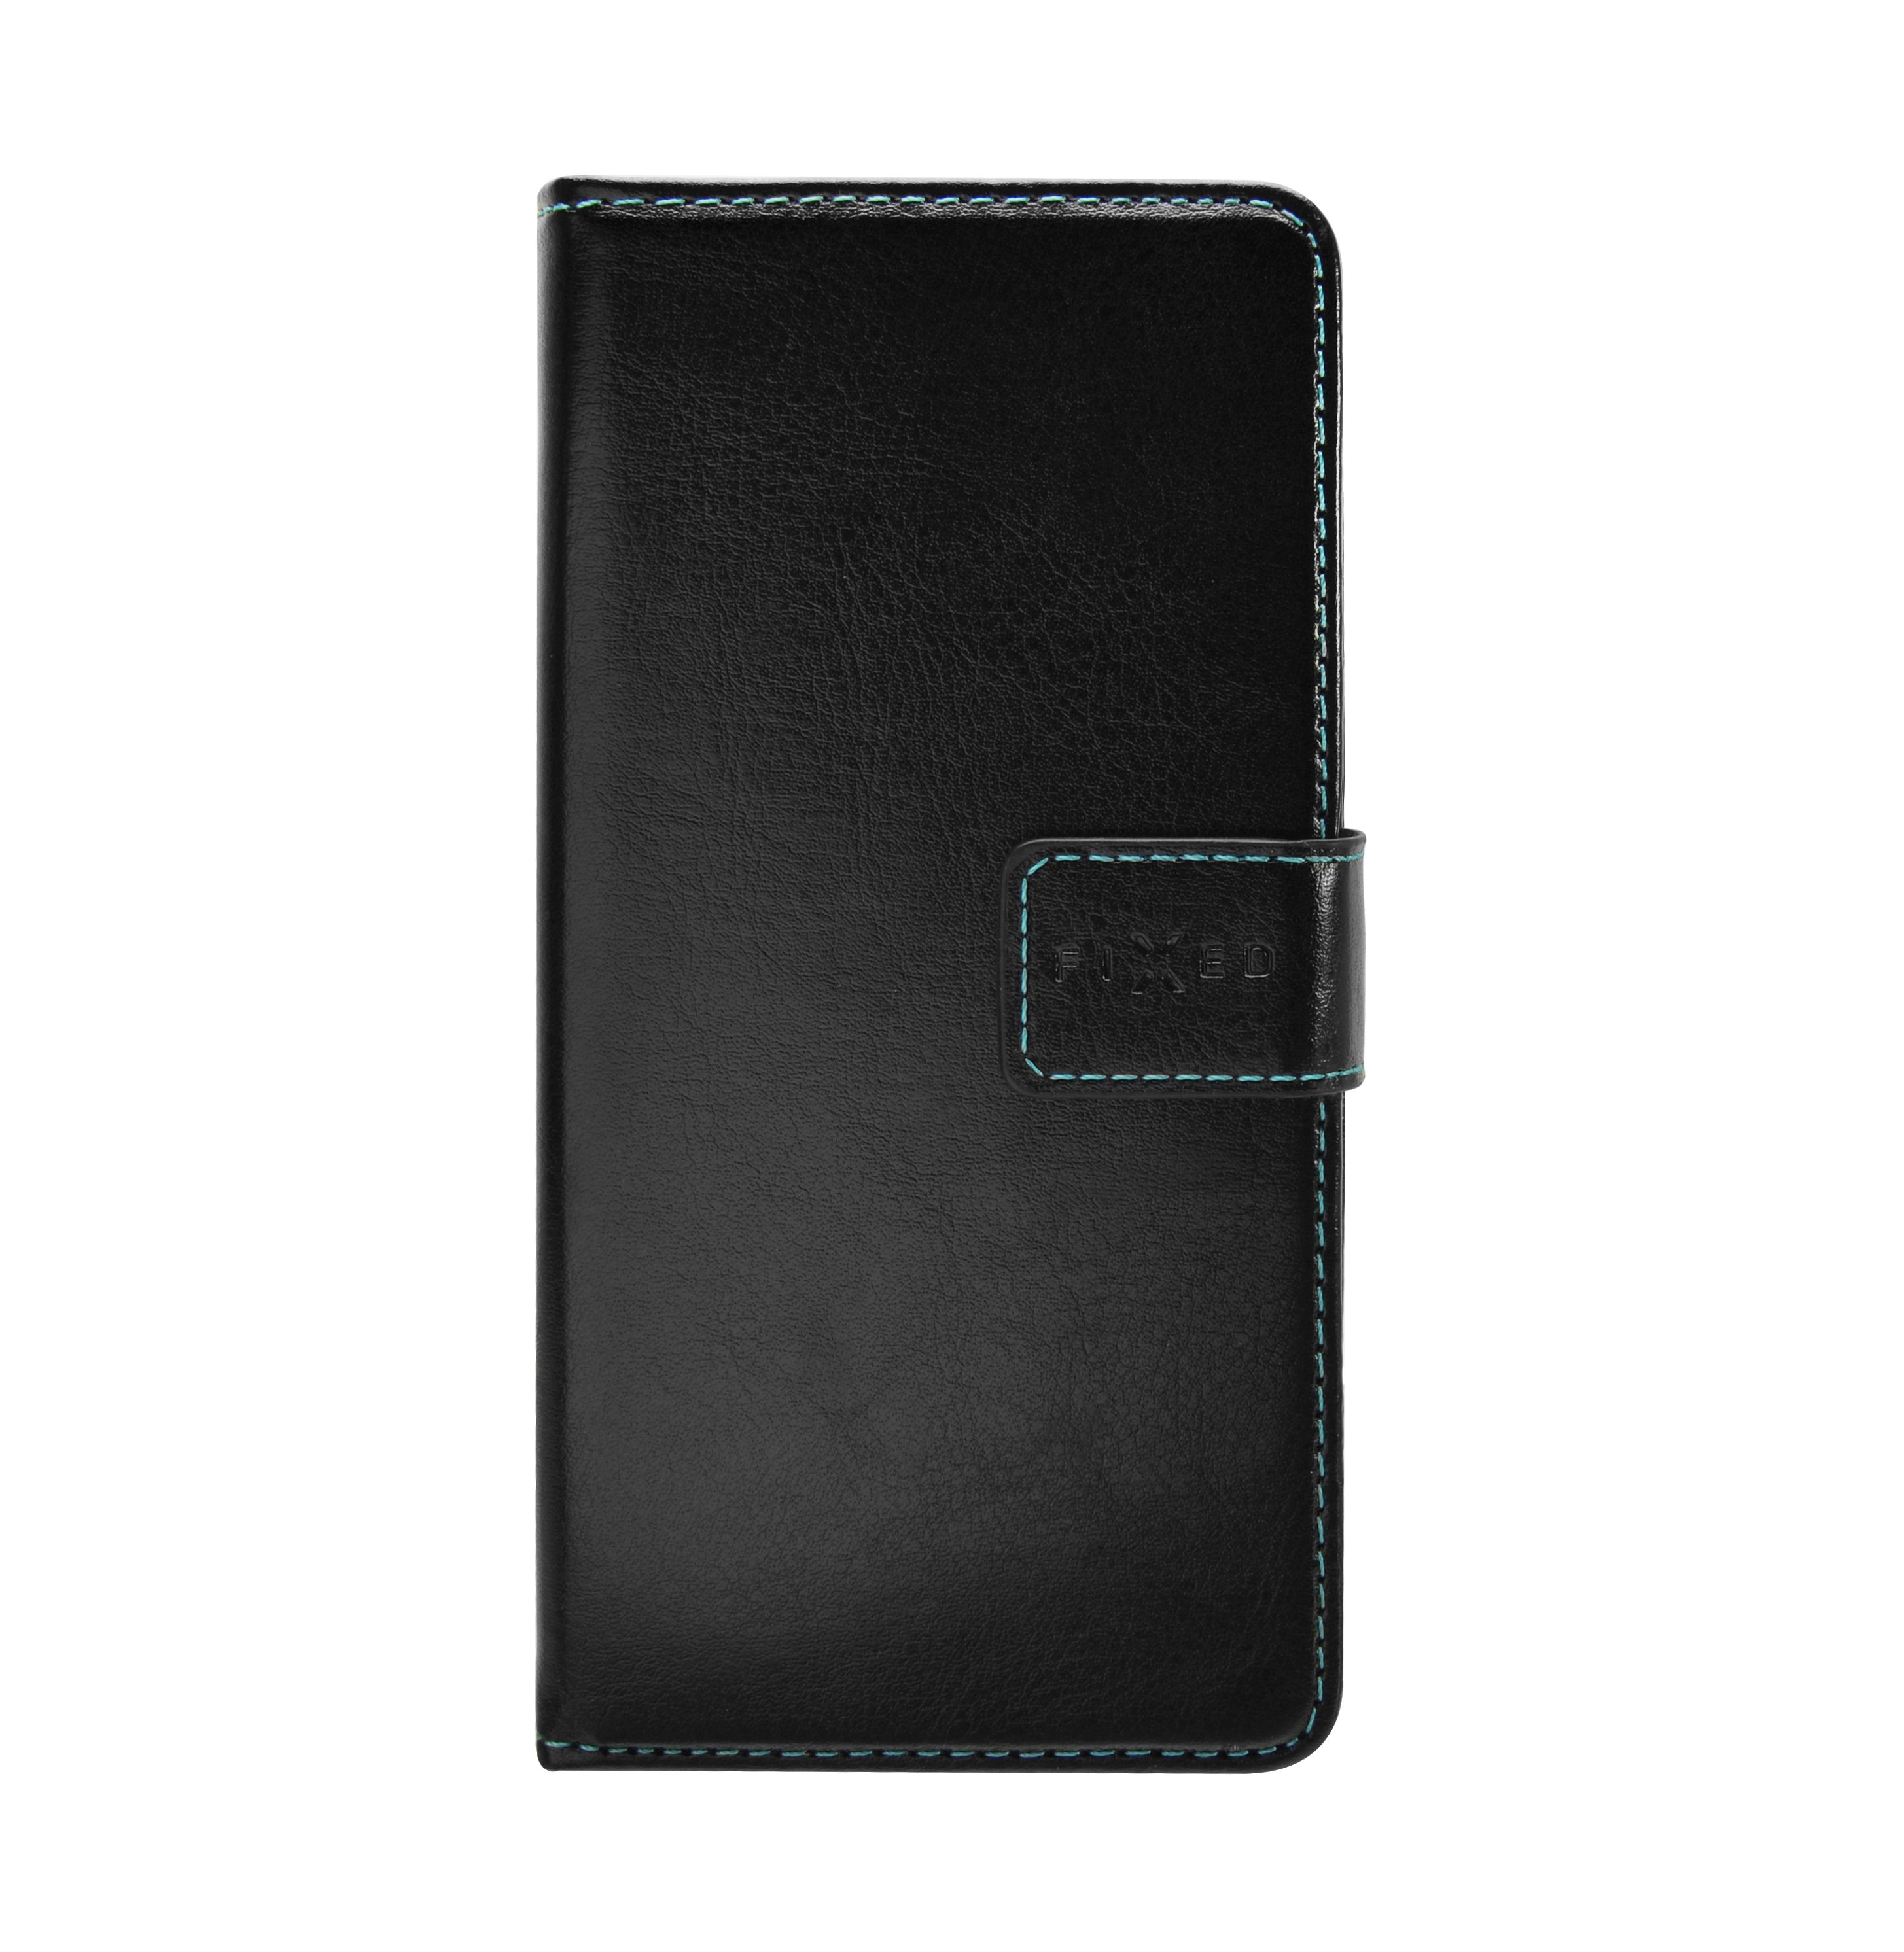 Pouzdro typu kniha FIXED Opus pro Sony Xperia 20, černé